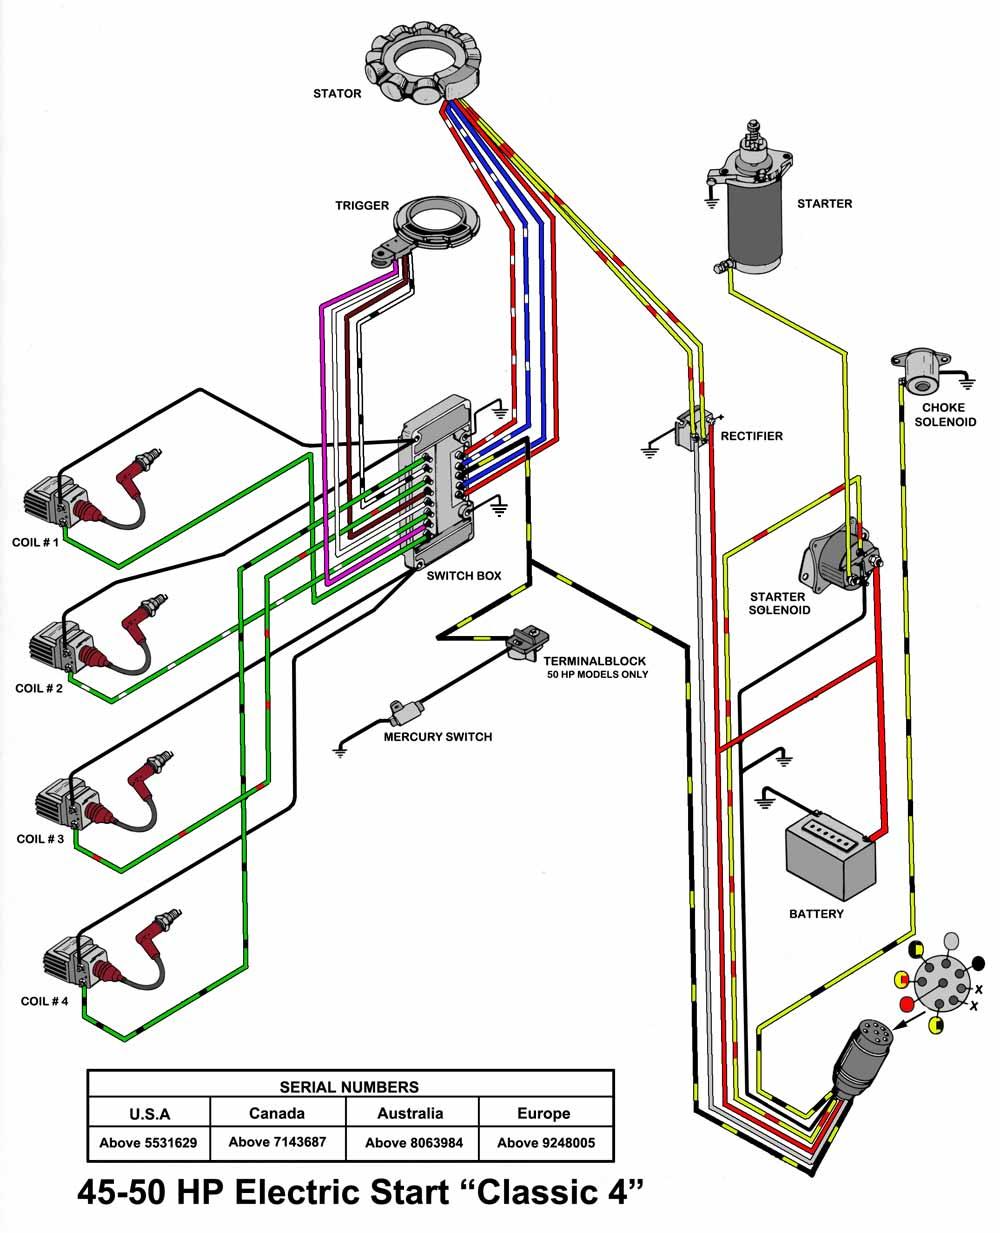 Saab Starter Wiring Diagram 03 Trusted Diagrams 900 Ignition House Symbols U2022 Vacuum Line